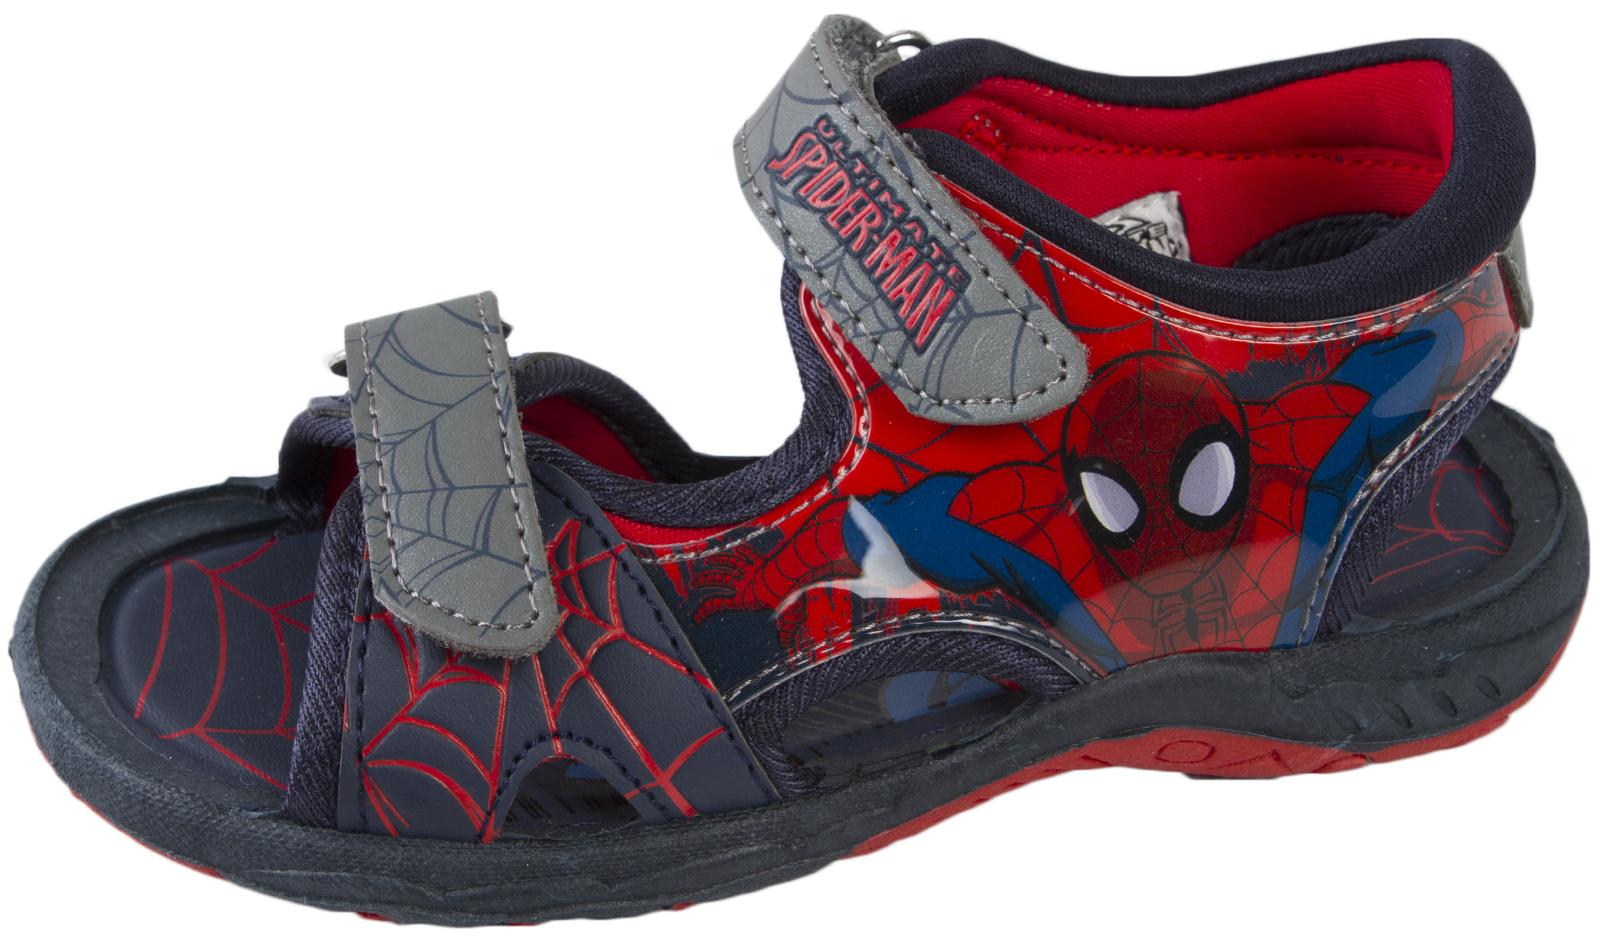 Spiderman Shoes Kids Shoes Uk